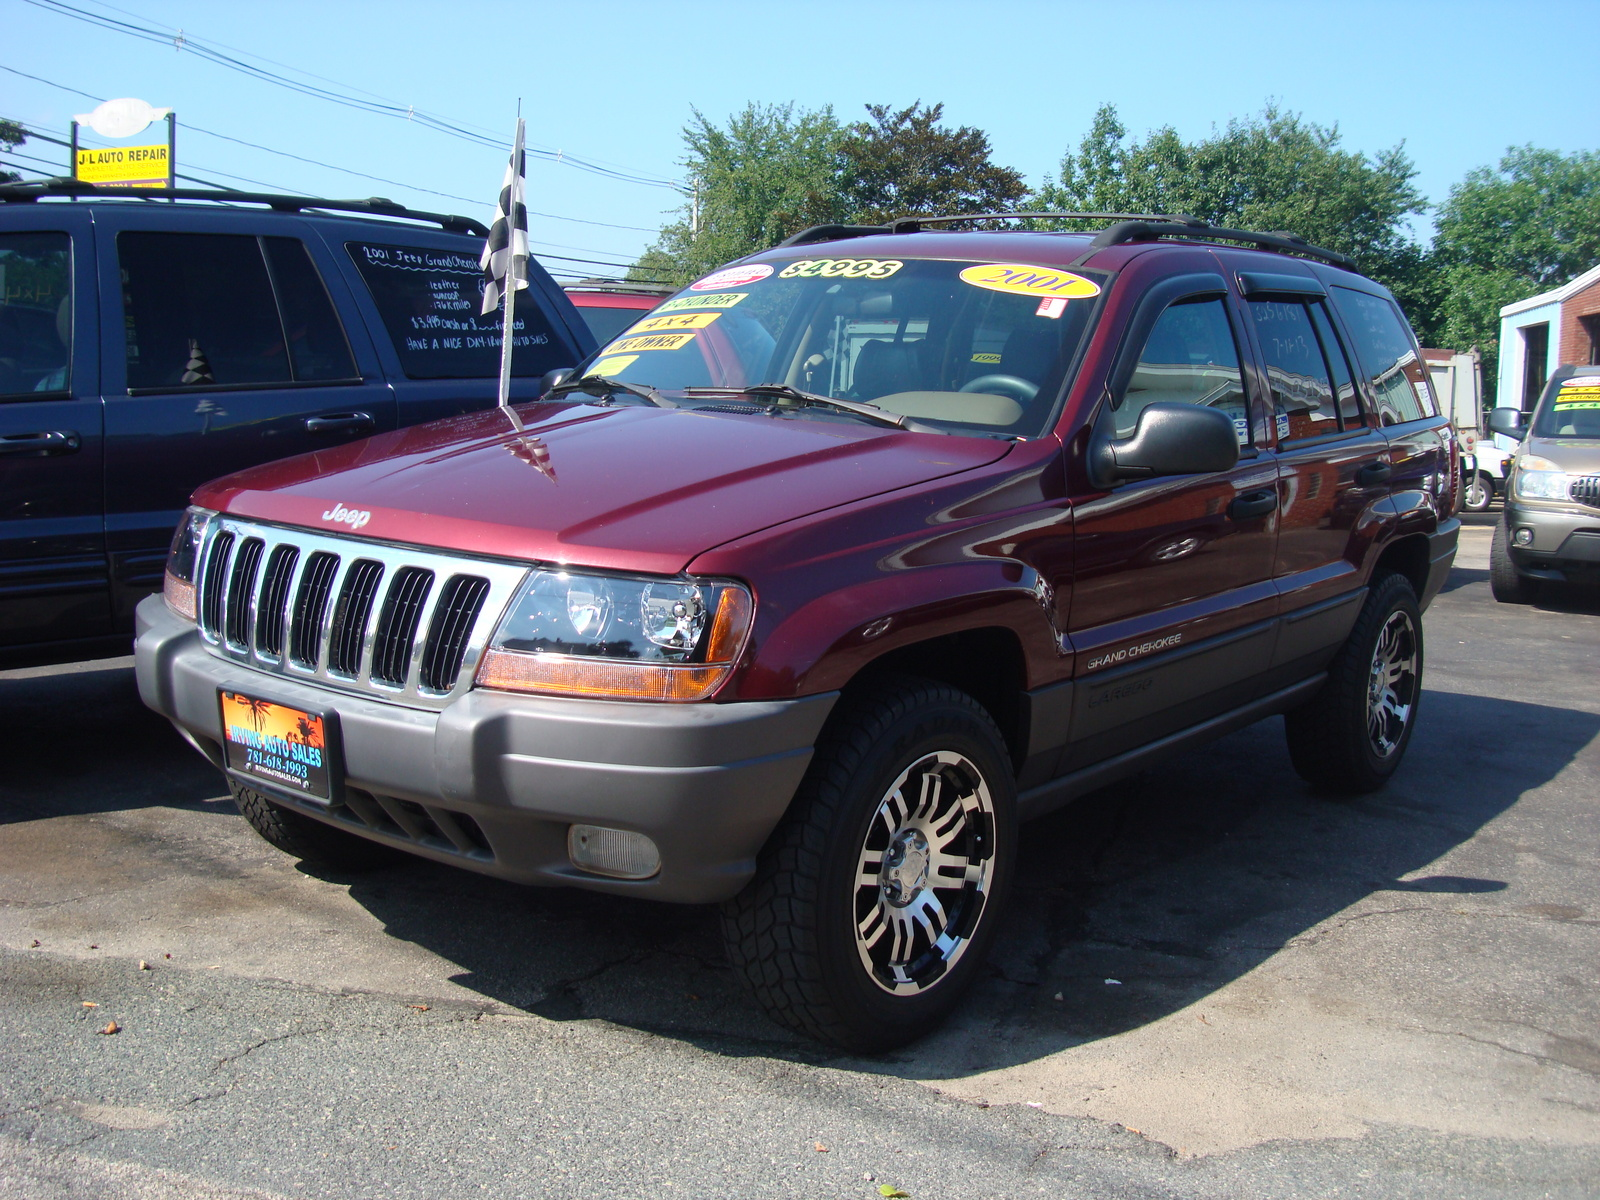 2007 Jeep Grand Cherokee Laredo Review U003eu003e 2001 Jeep Grand Cherokee    Pictures   CarGurus